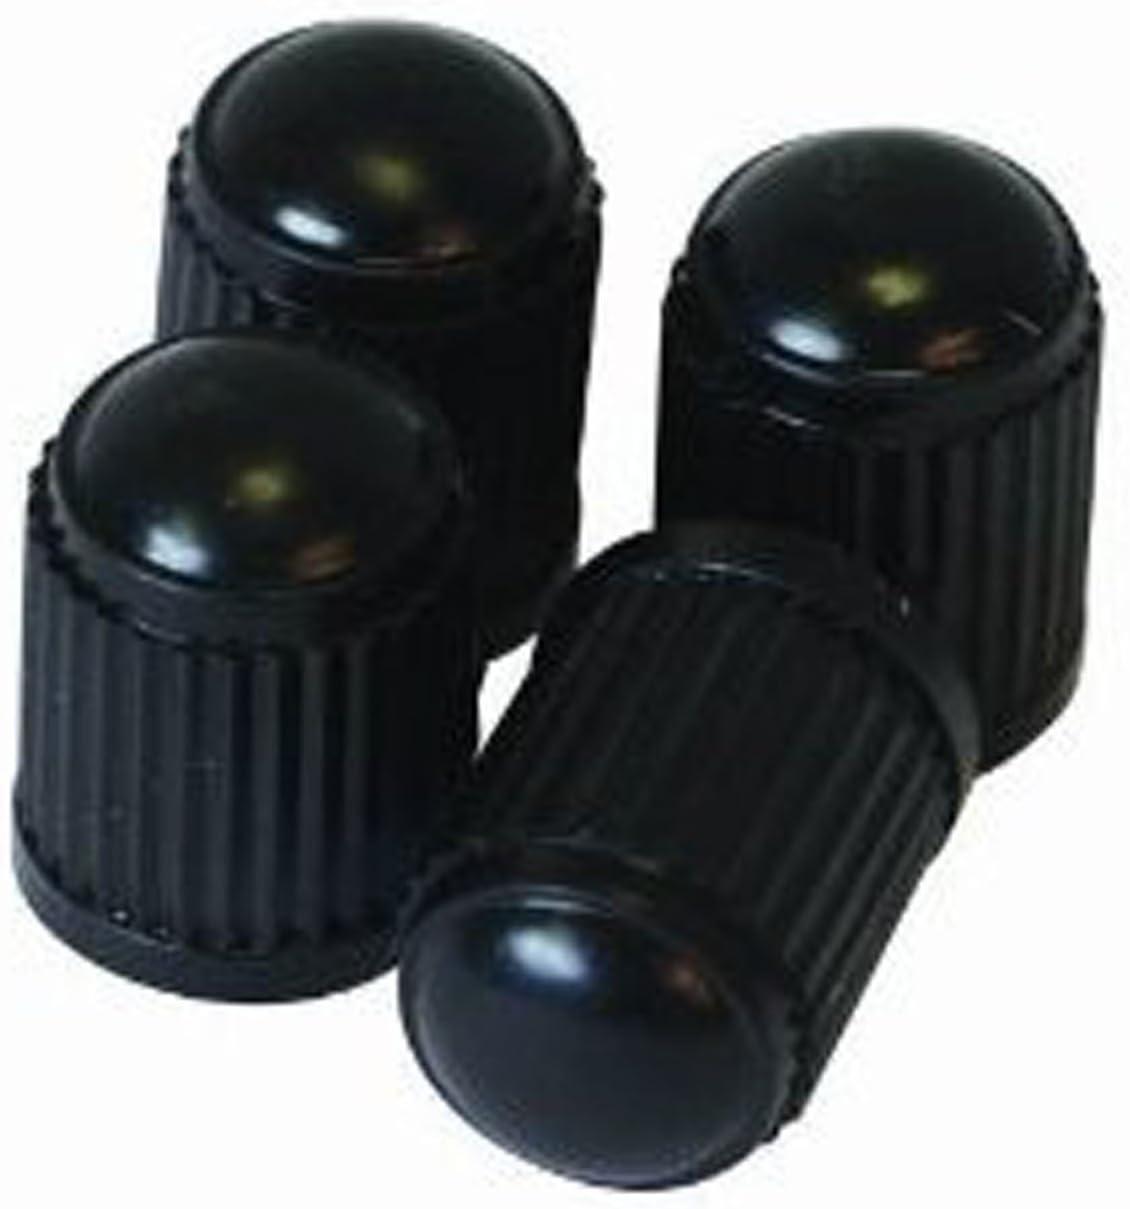 4 x Round Valve Caps Set Brass Car Motorcycle Van Wheel Dust Cap Cover Silver